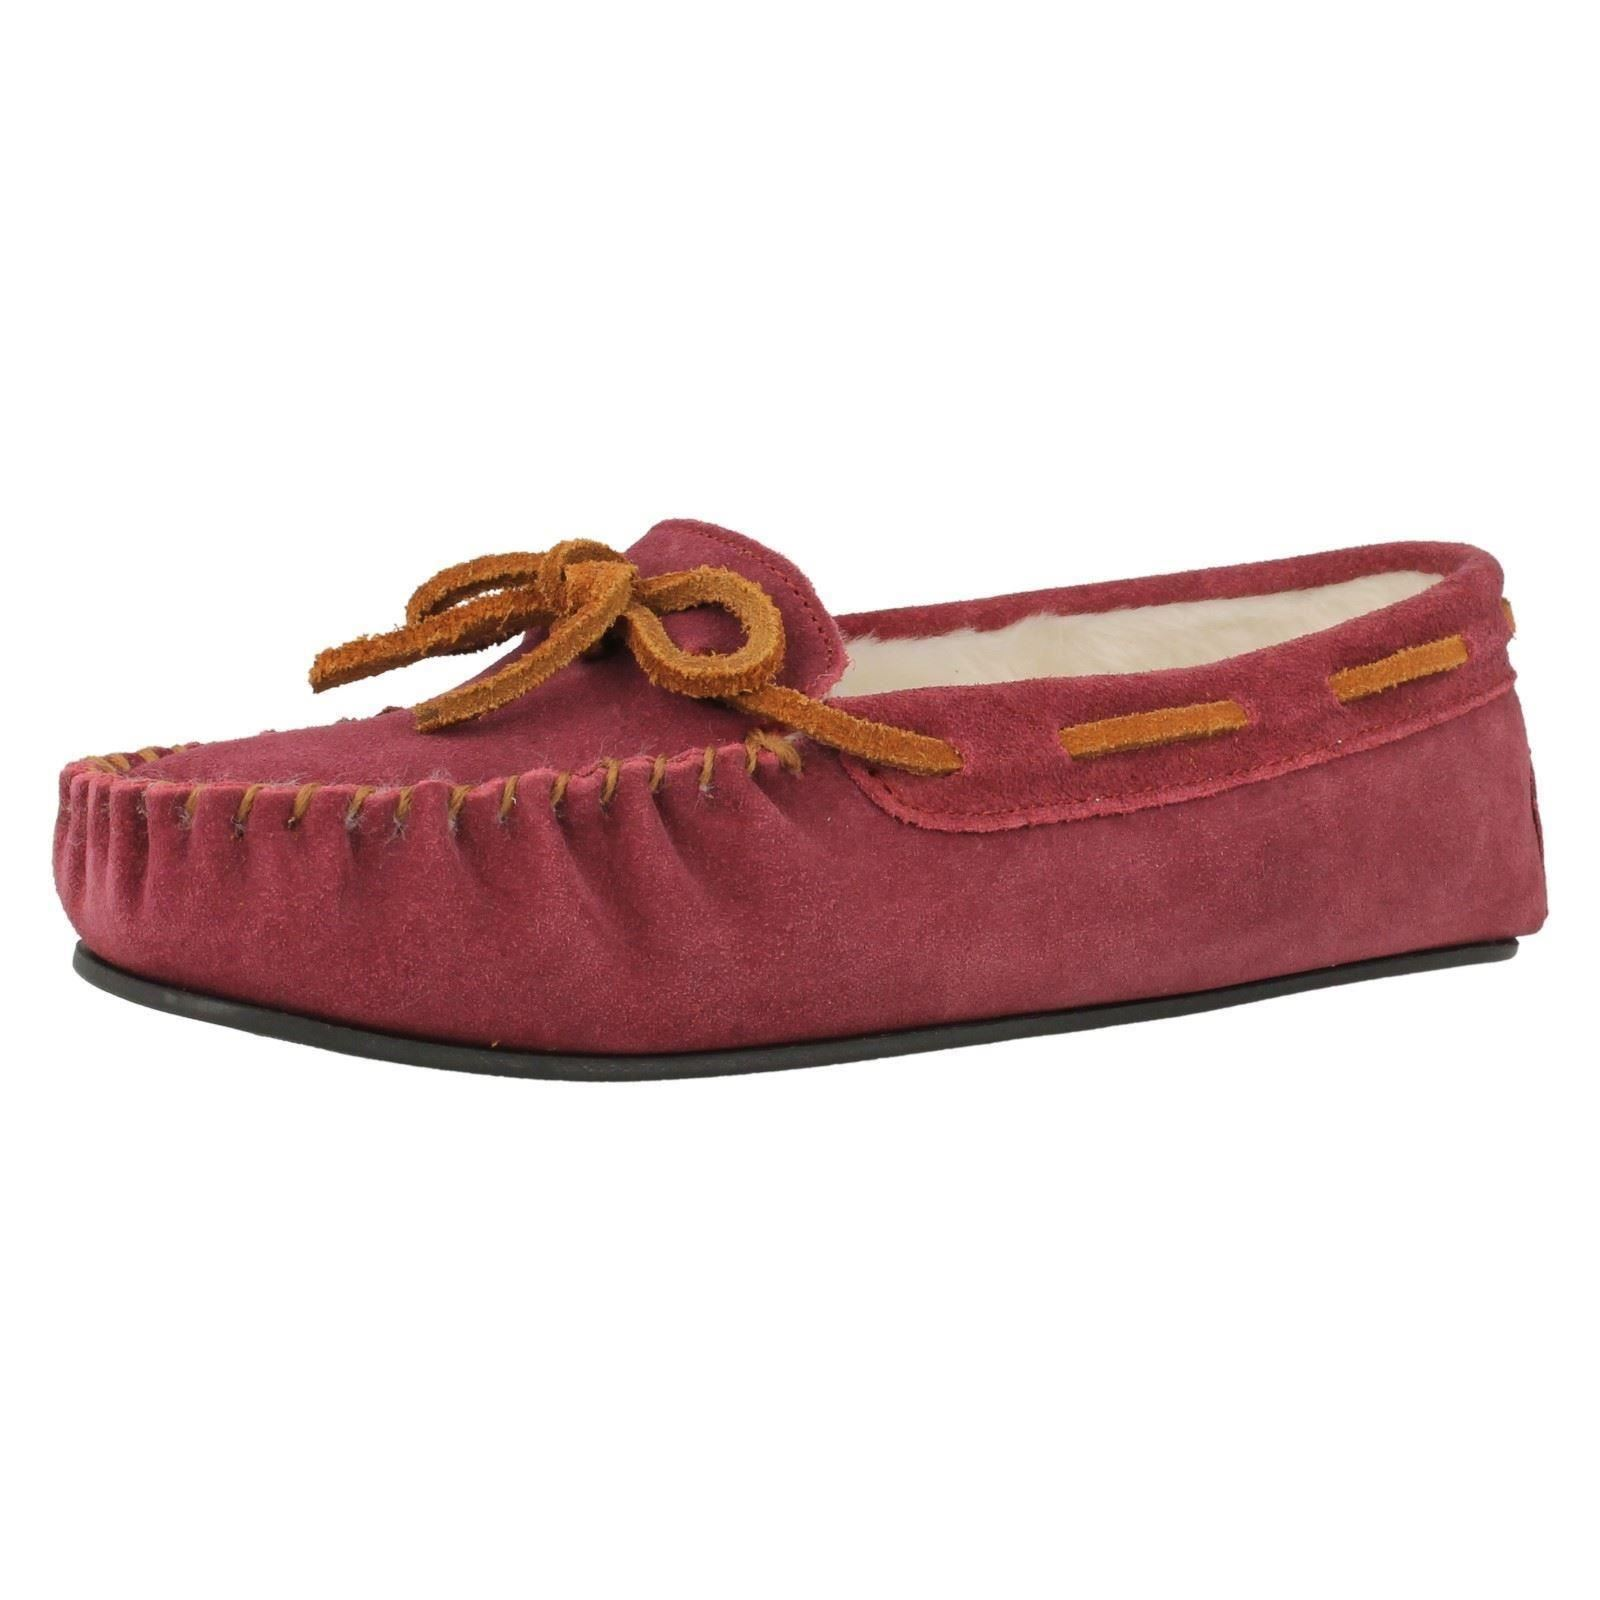 Clarks Shoes Ladies Moccasins